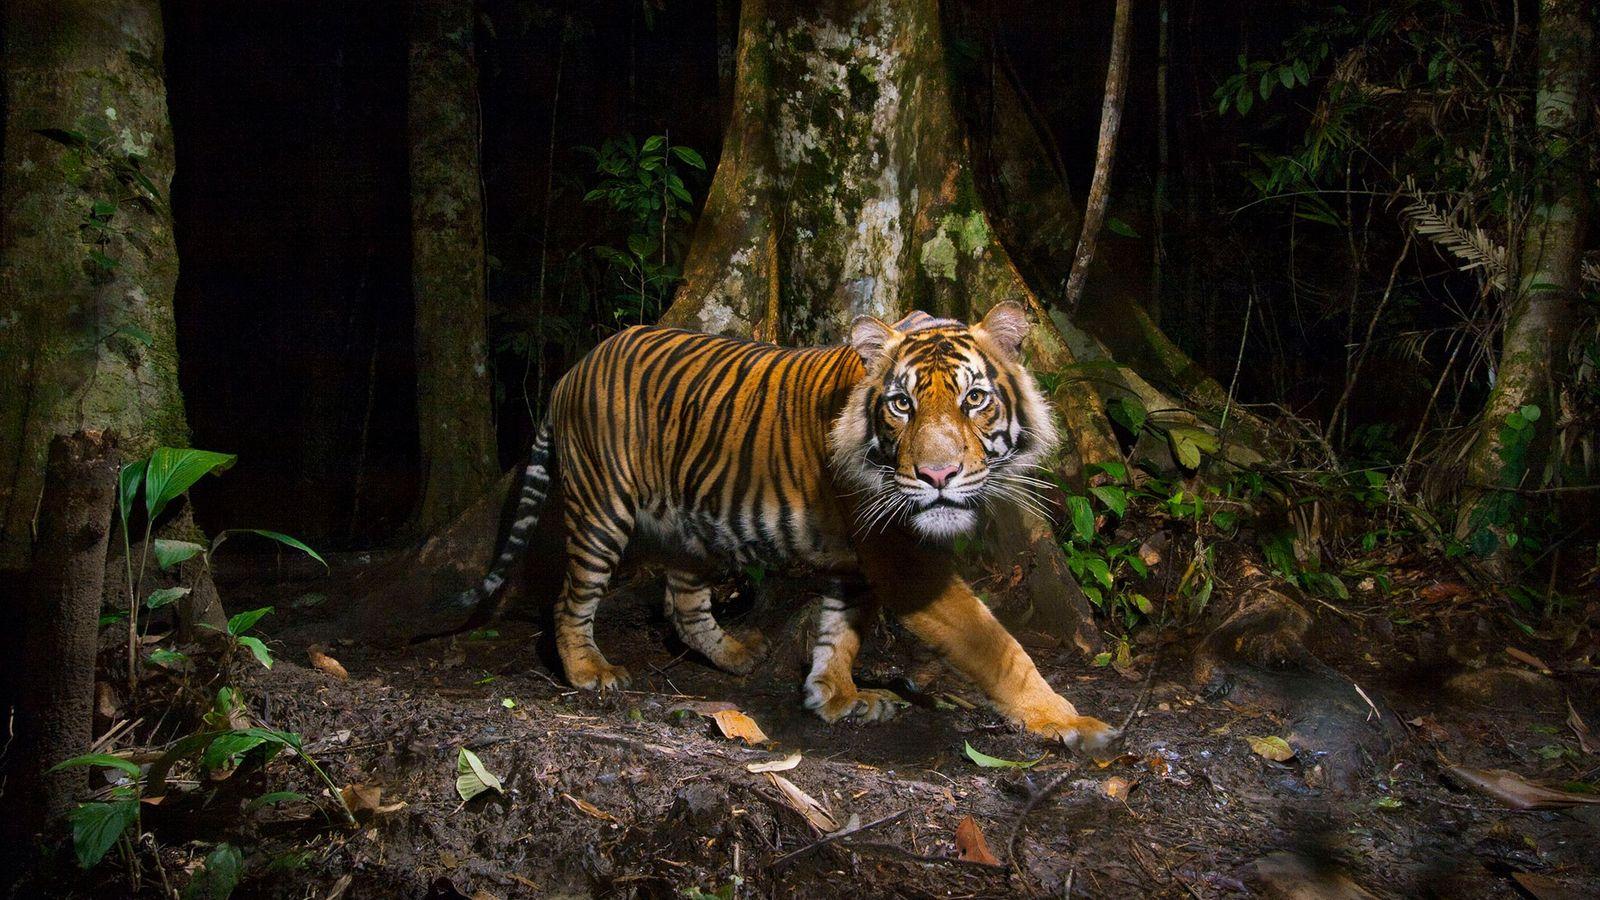 A remote camera captures a Sumatran tiger while hunting in Sumatra, Indonesia.